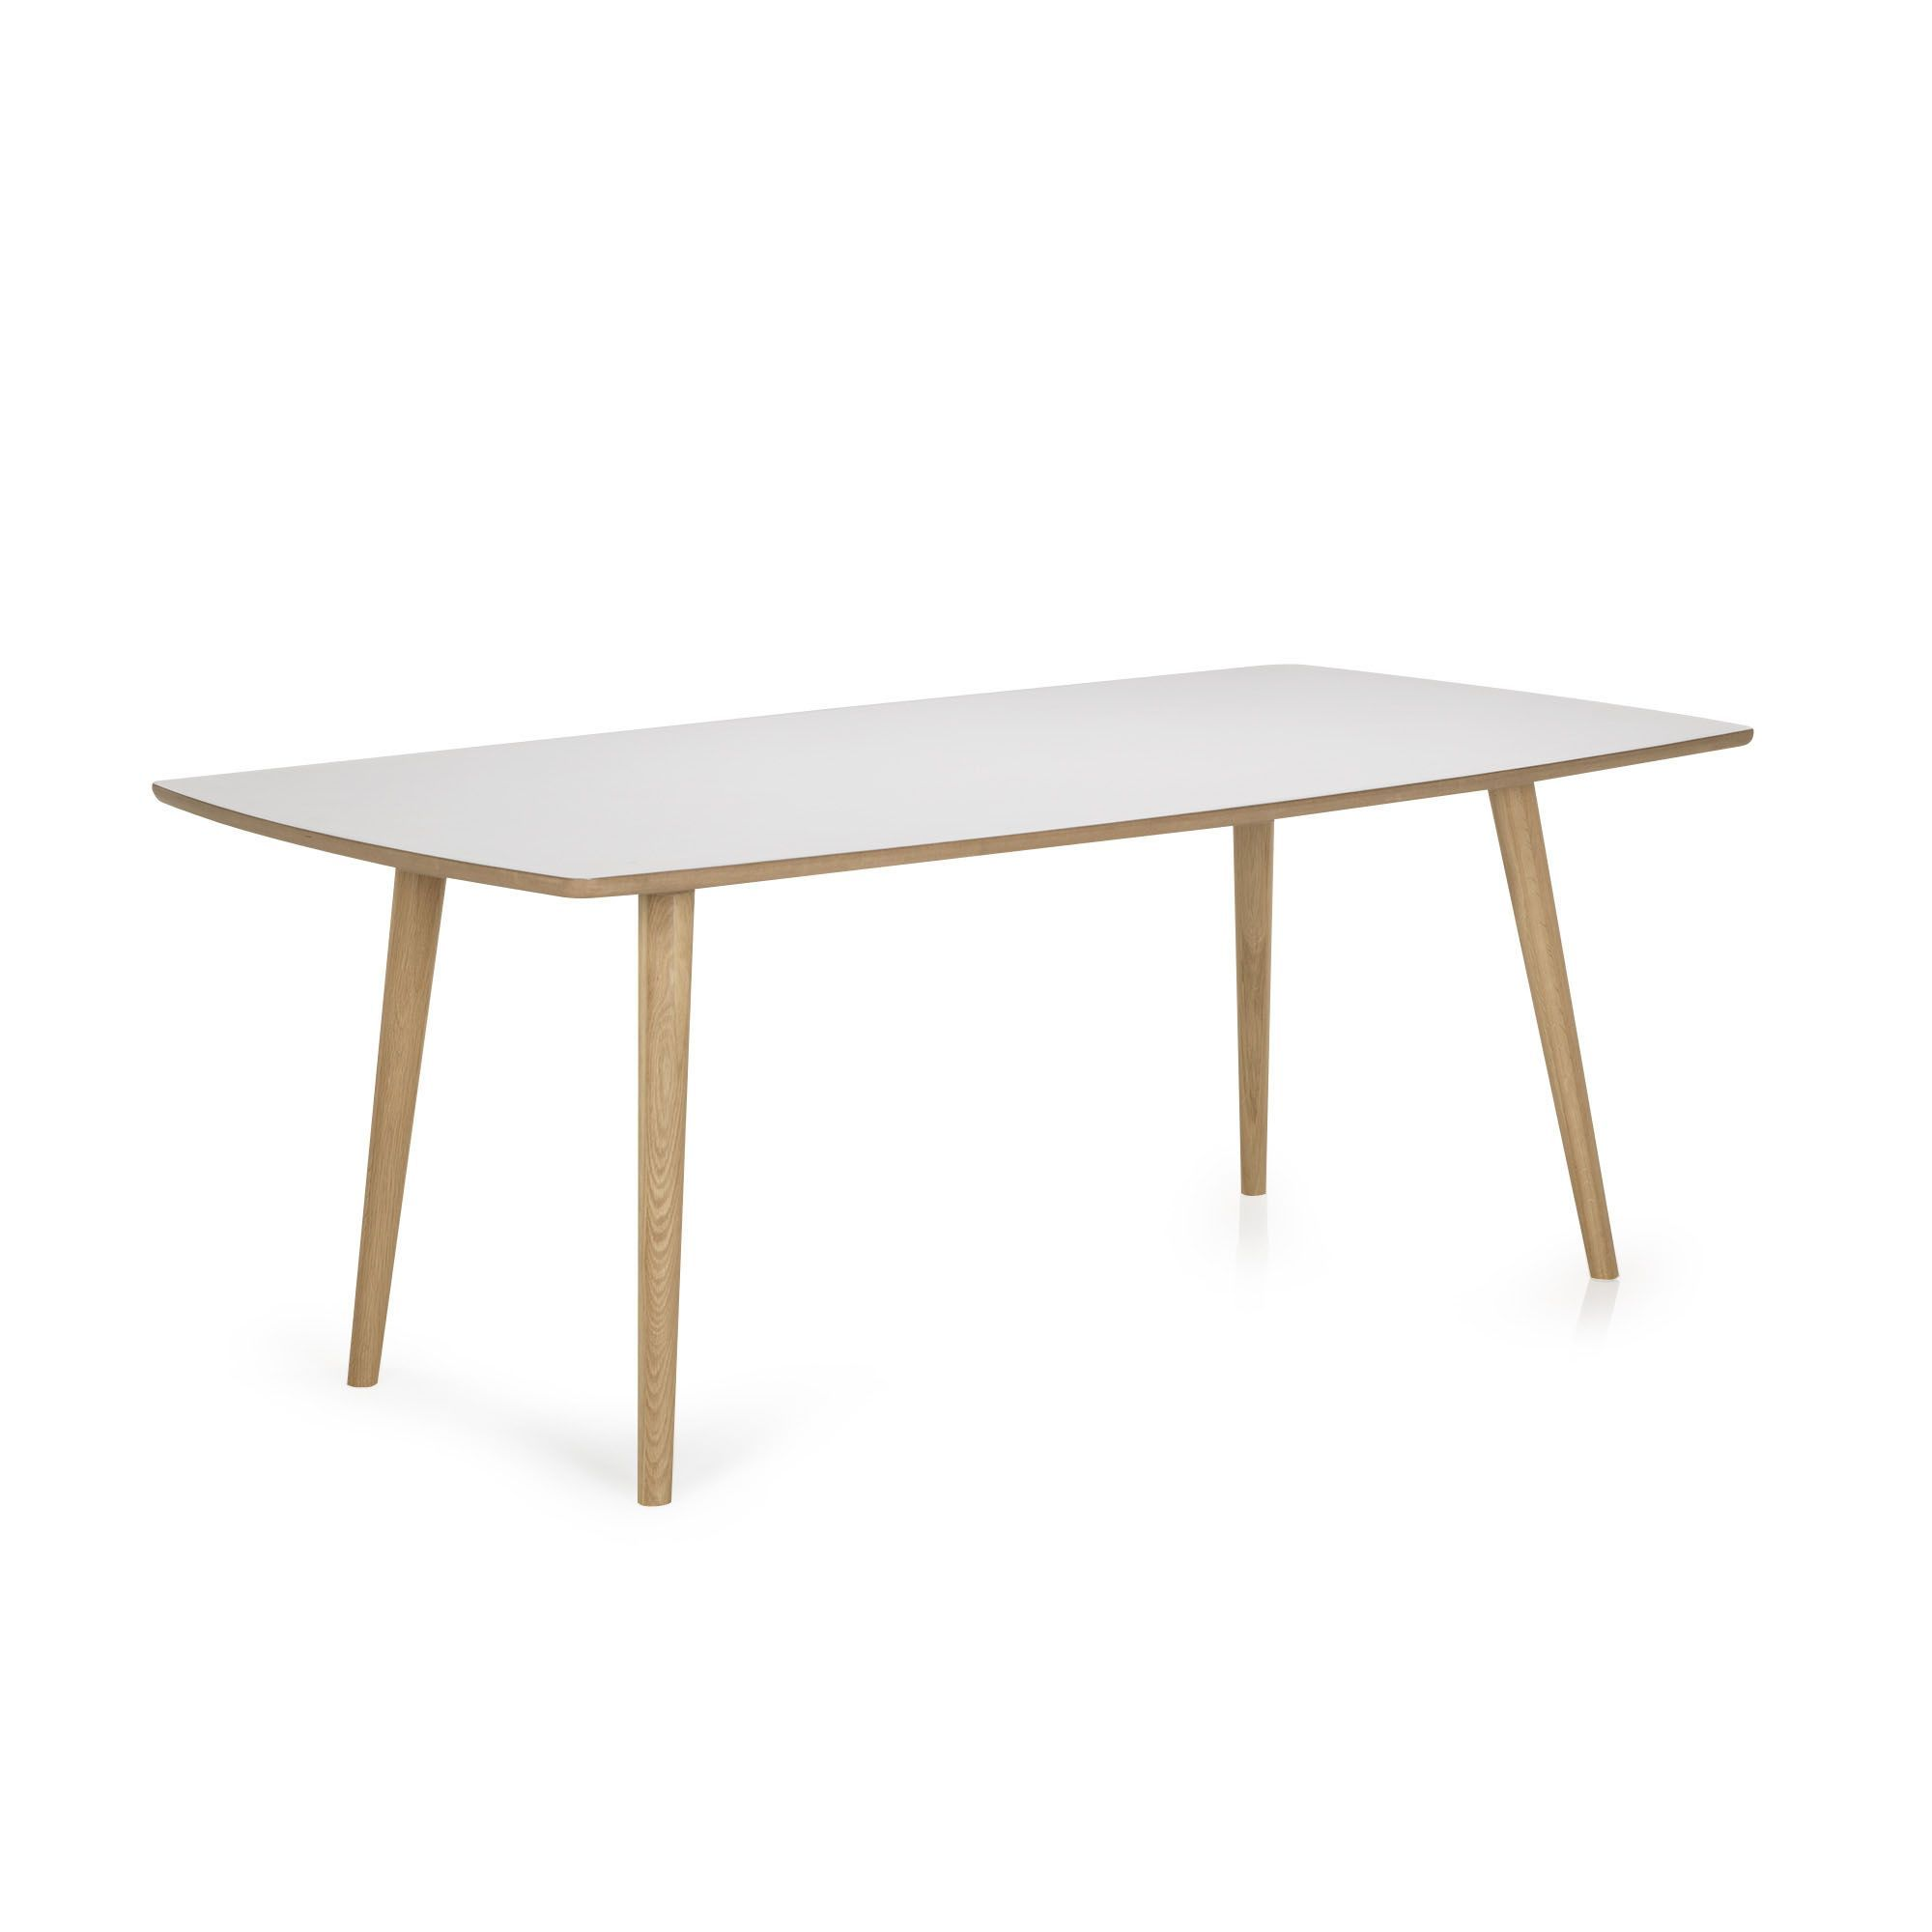 f019fa87a32c4c5317e4778cc0b8e1a1 Incroyable De Table Basse Anglais Conception